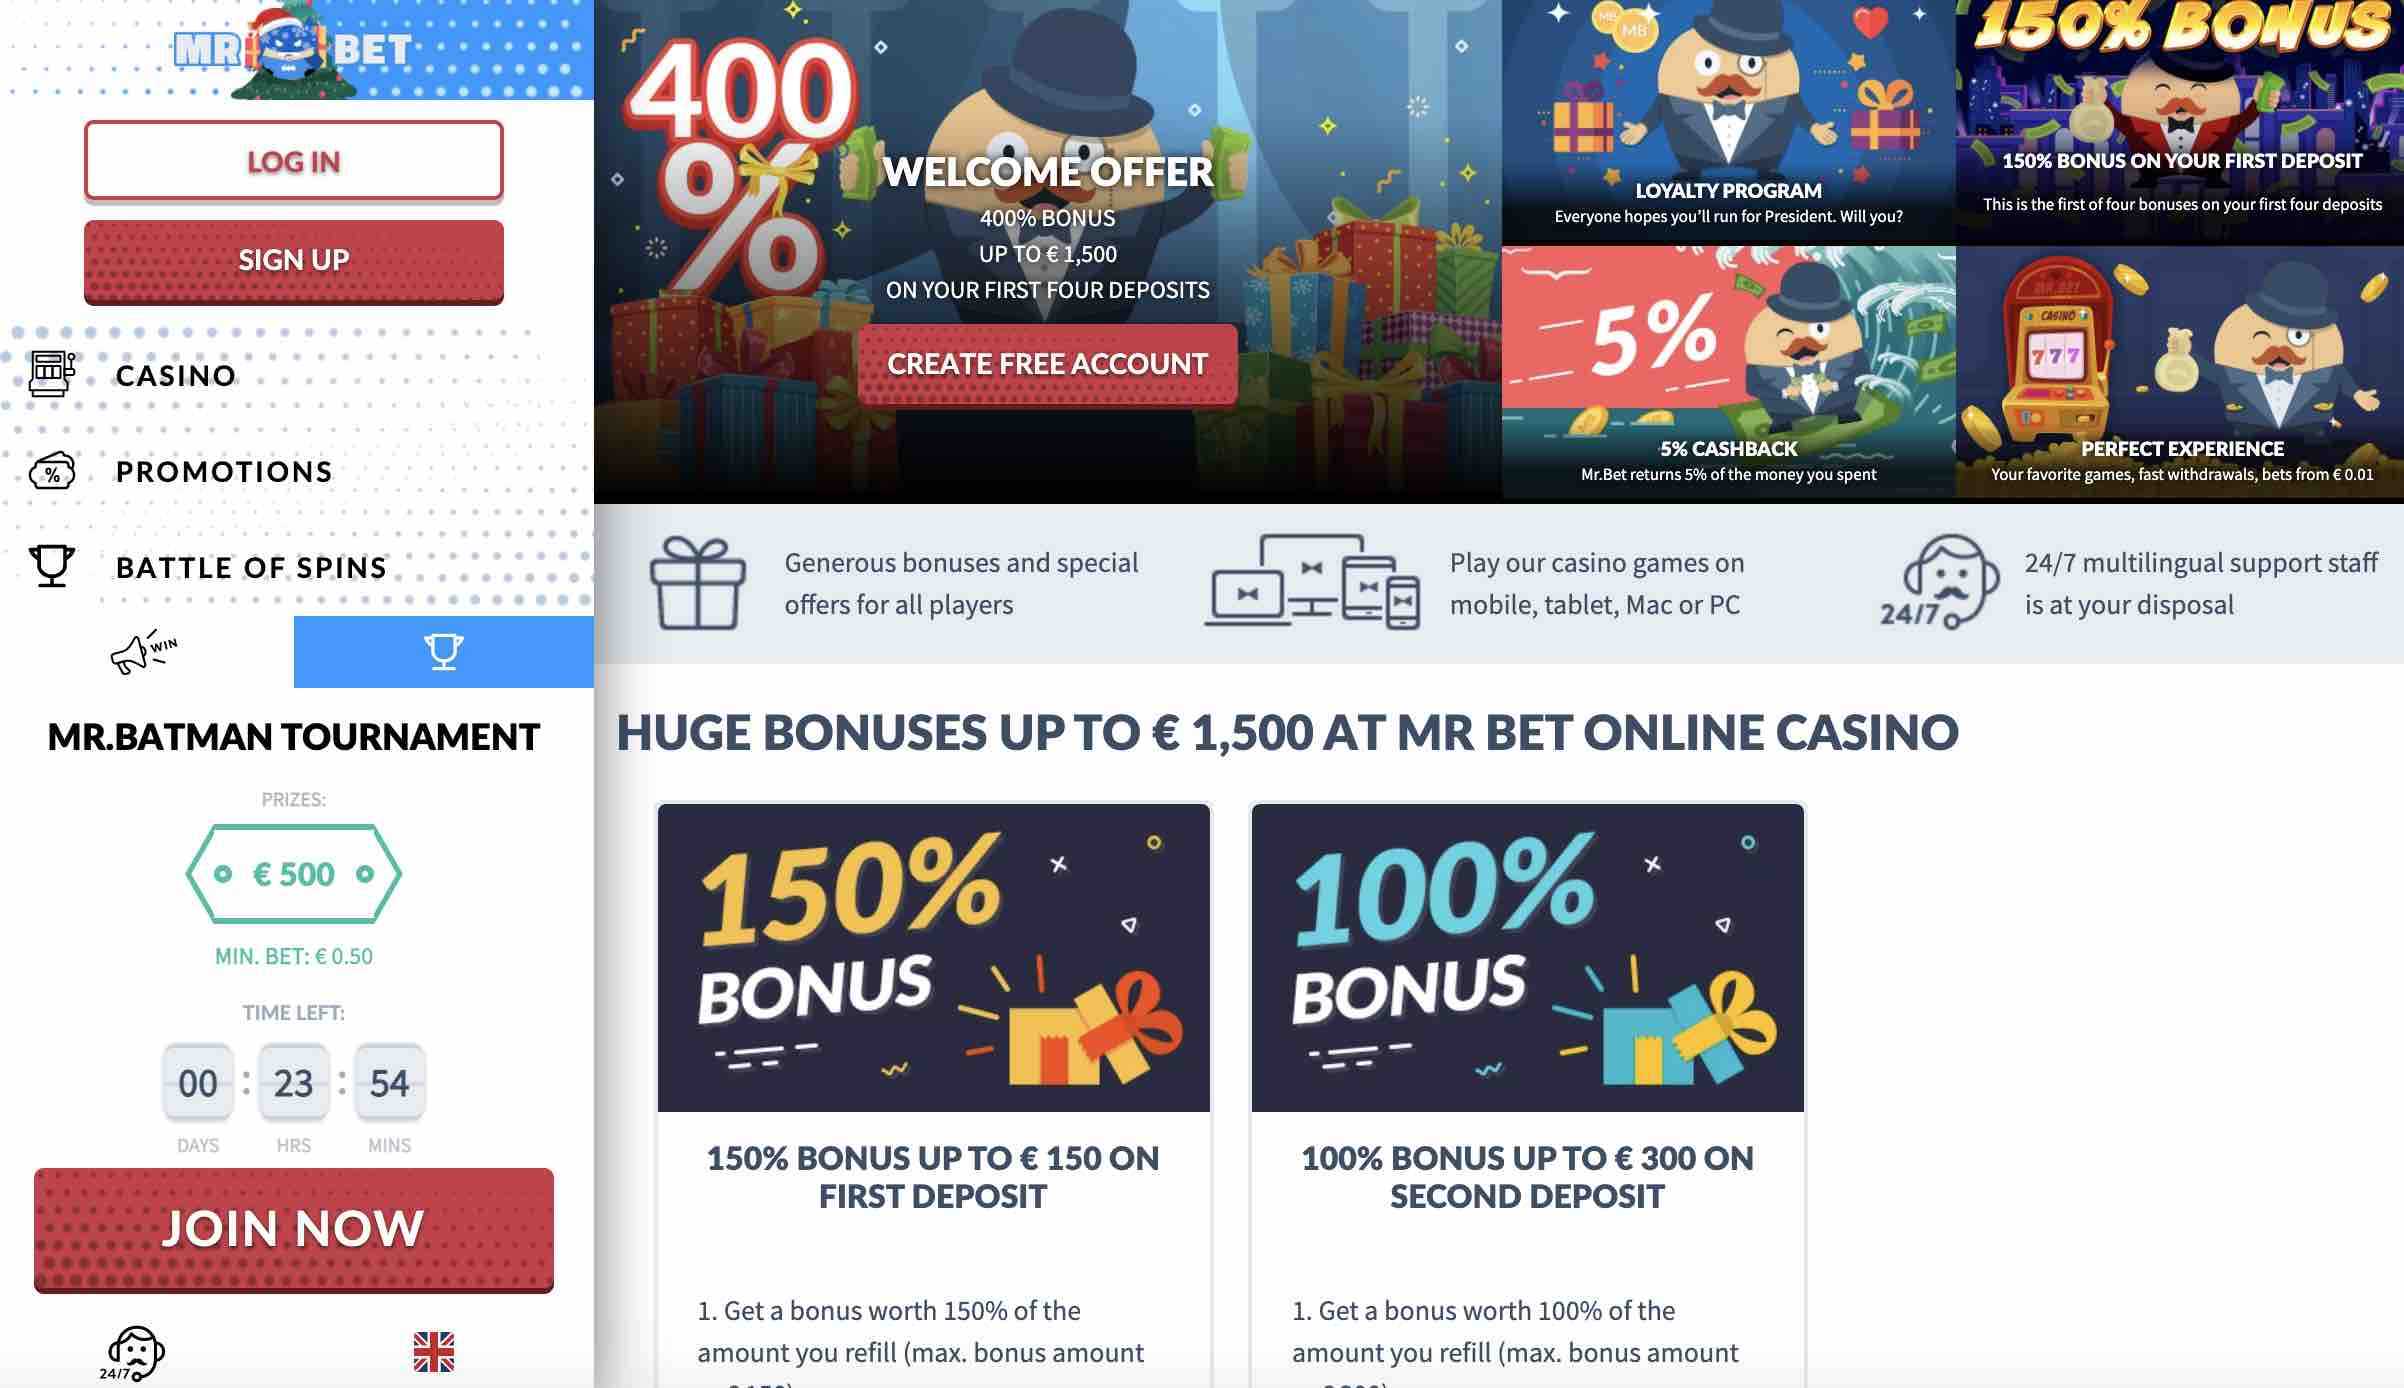 Mr Bet Casino Promotions